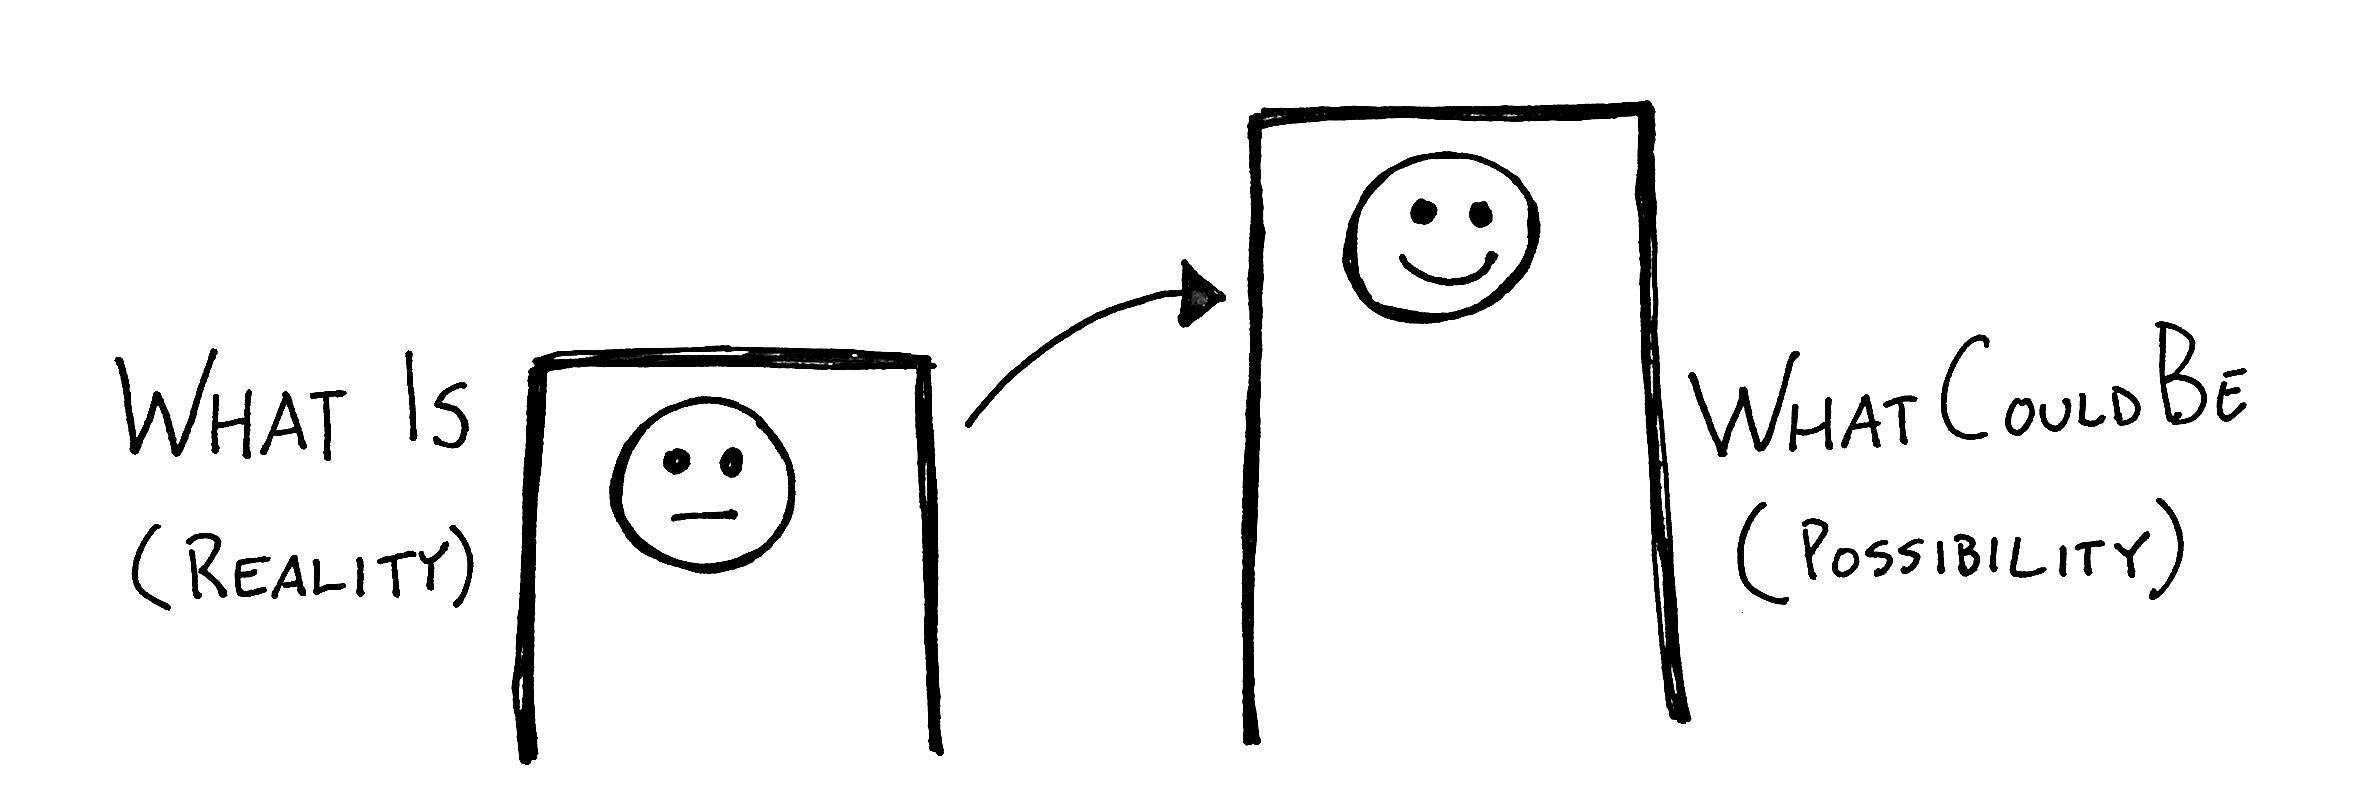 Blog post-p1 (1).jpg